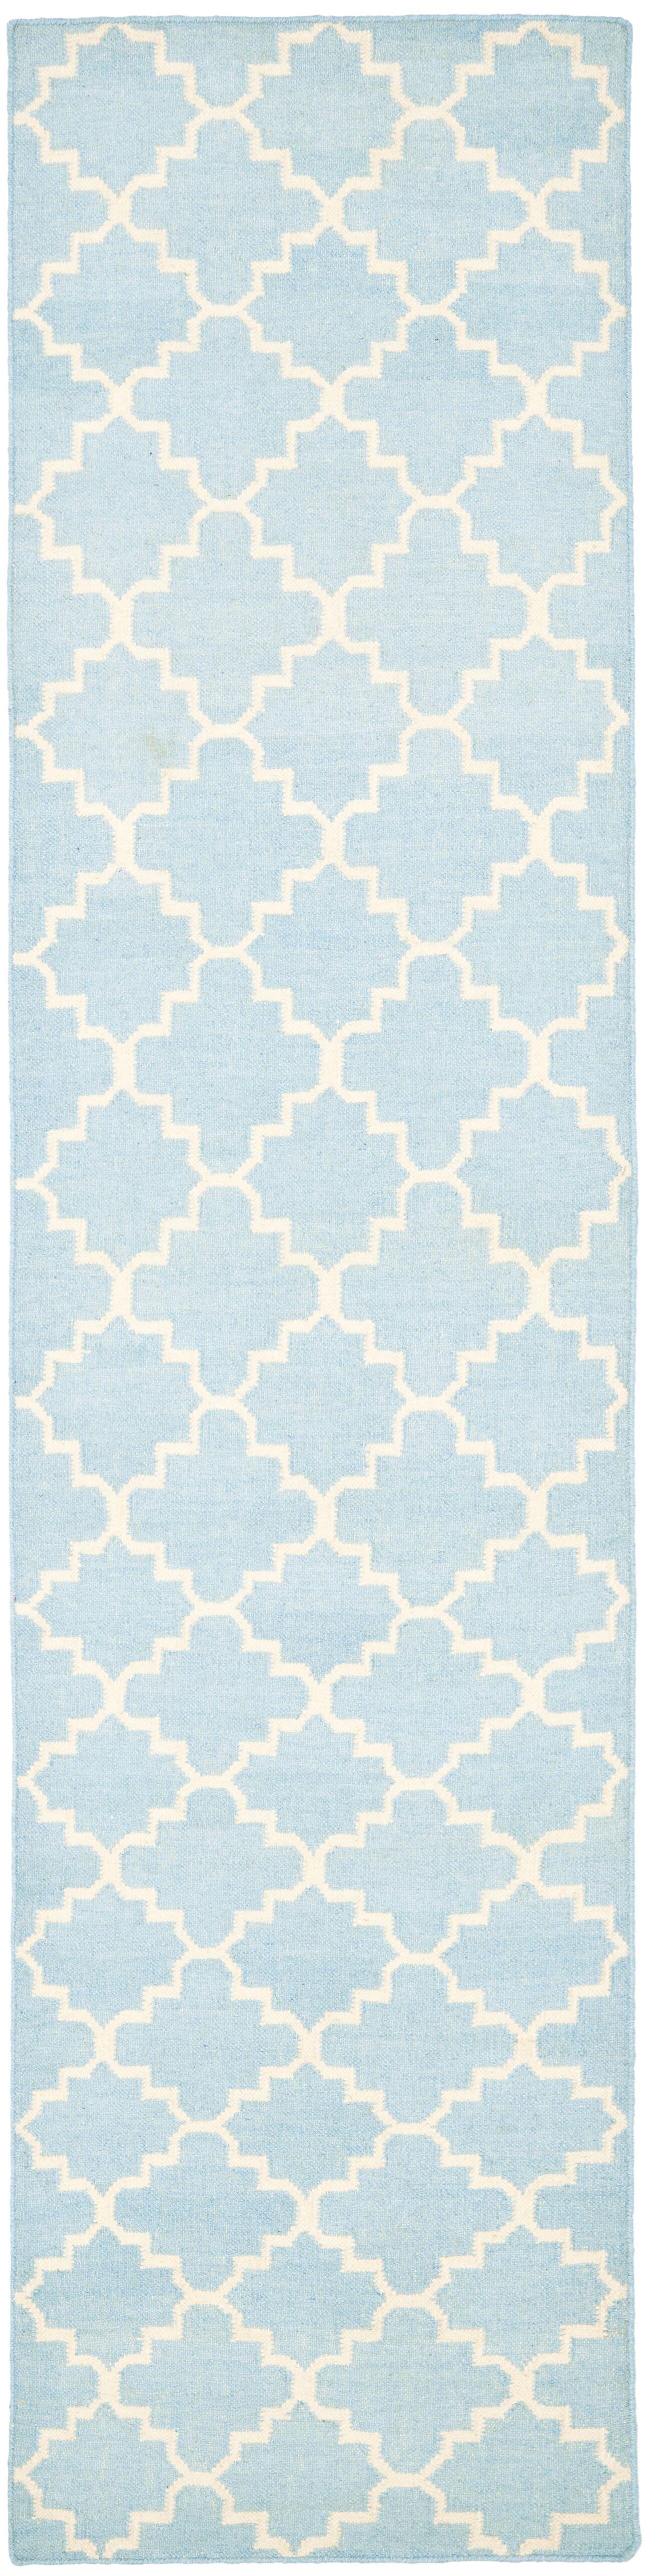 Danbury Hand-Woven Wool Light Blue/Ivory Area Rug Rug Size: Runner 2'6